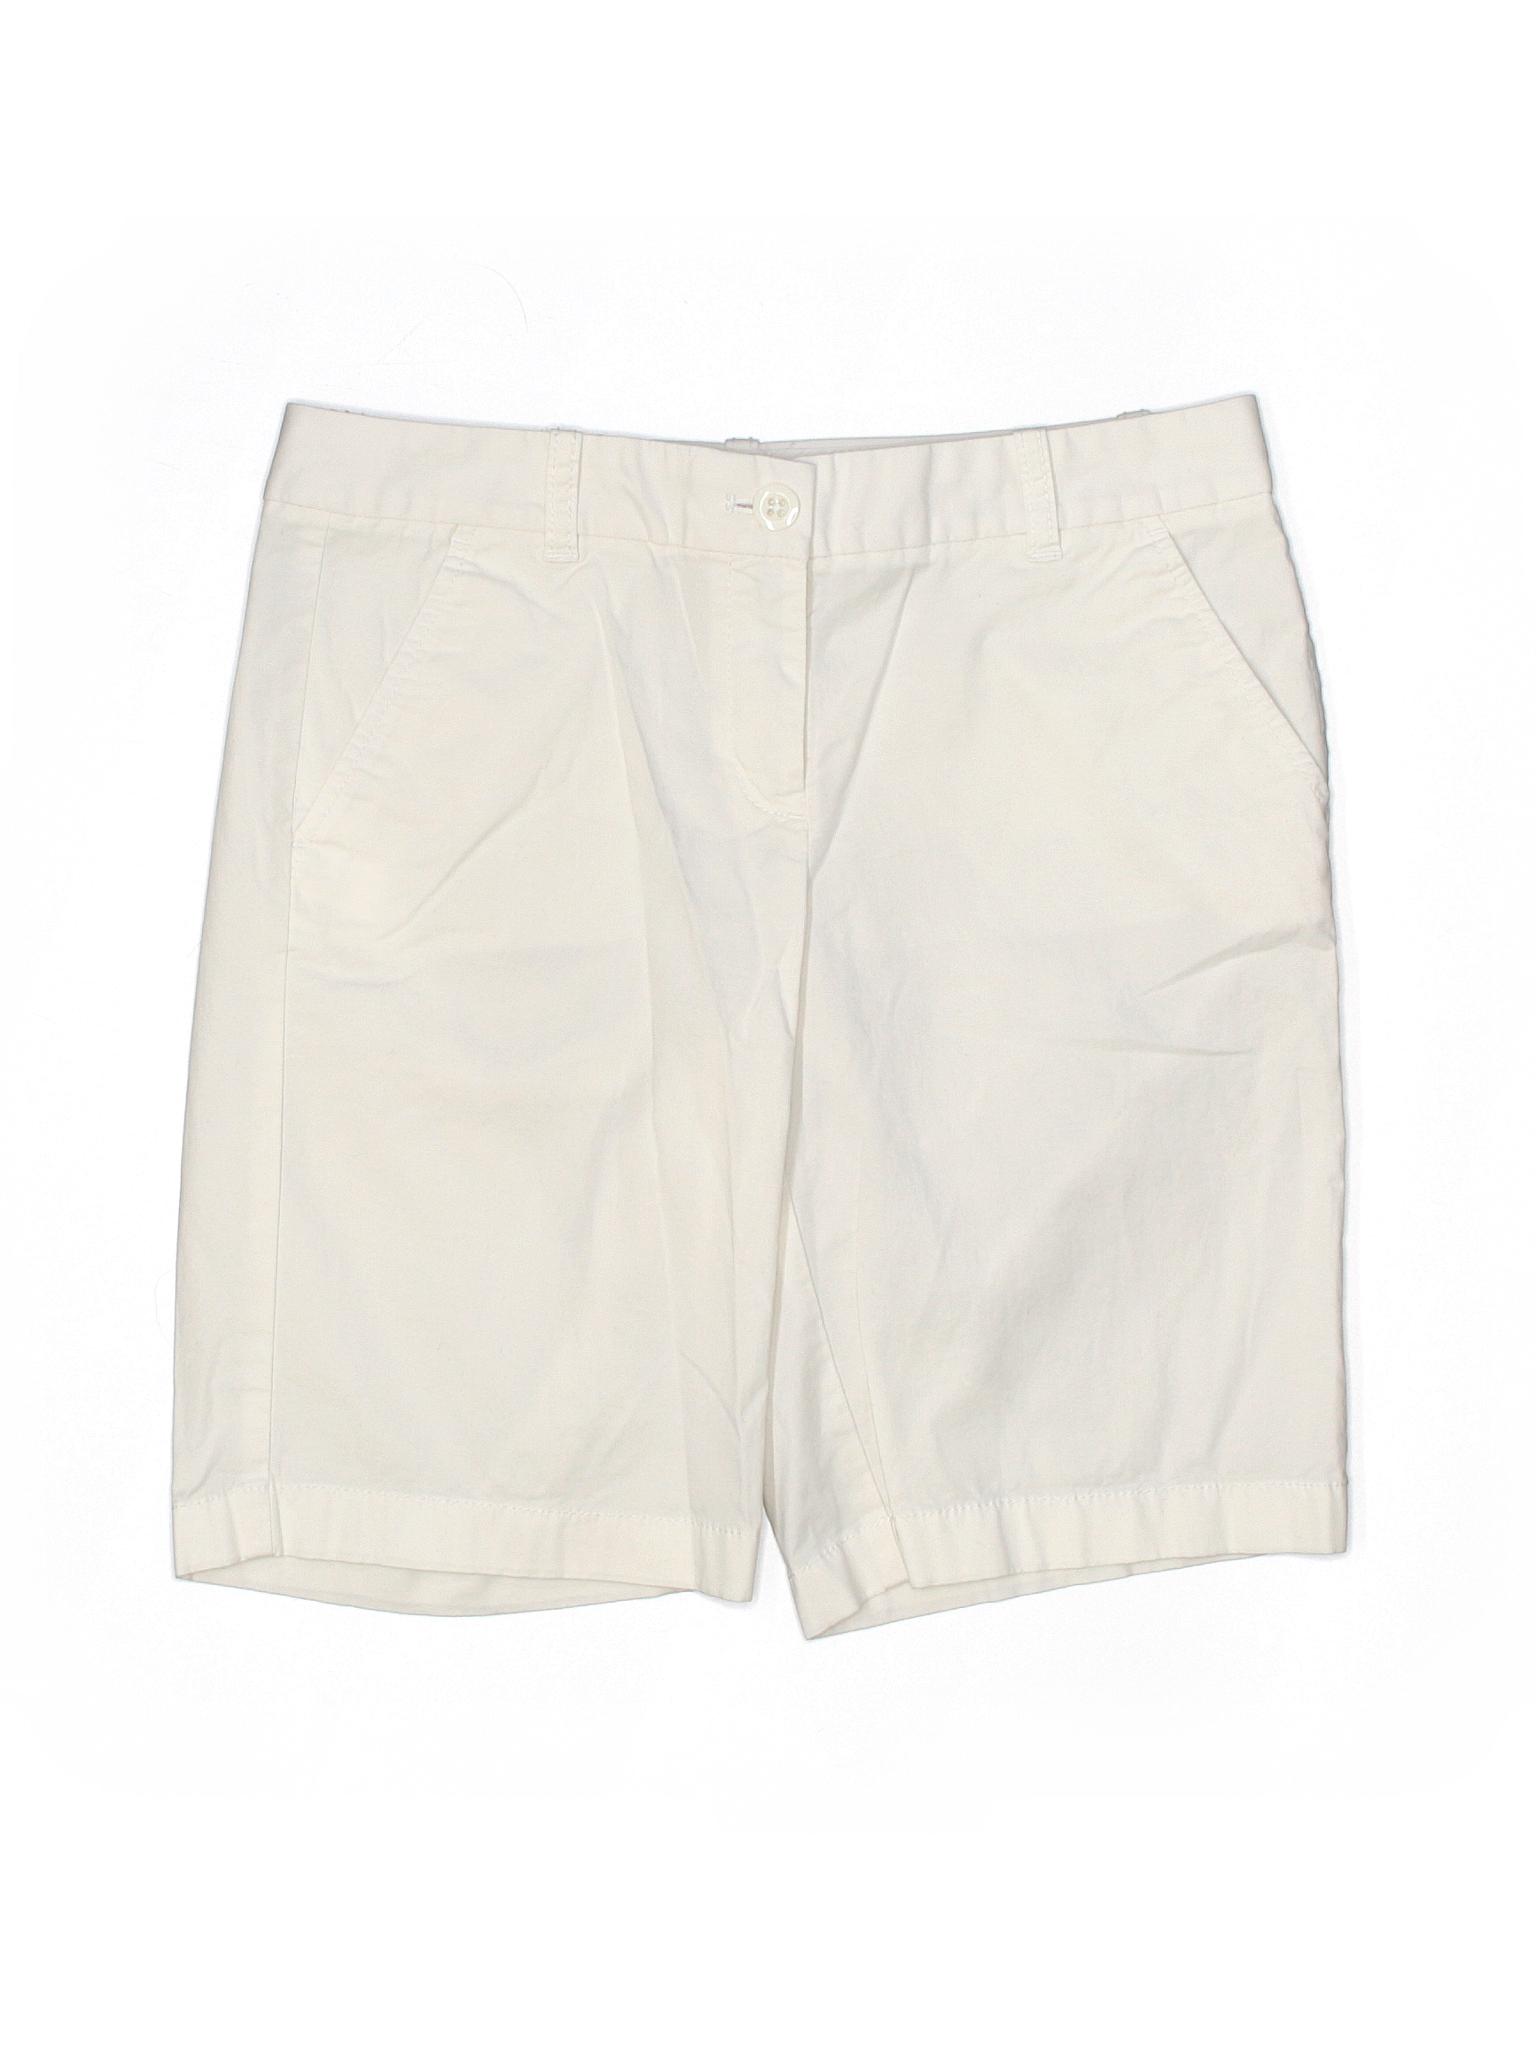 Khaki Boutique Crew Boutique J Shorts J Oqx1IxwT